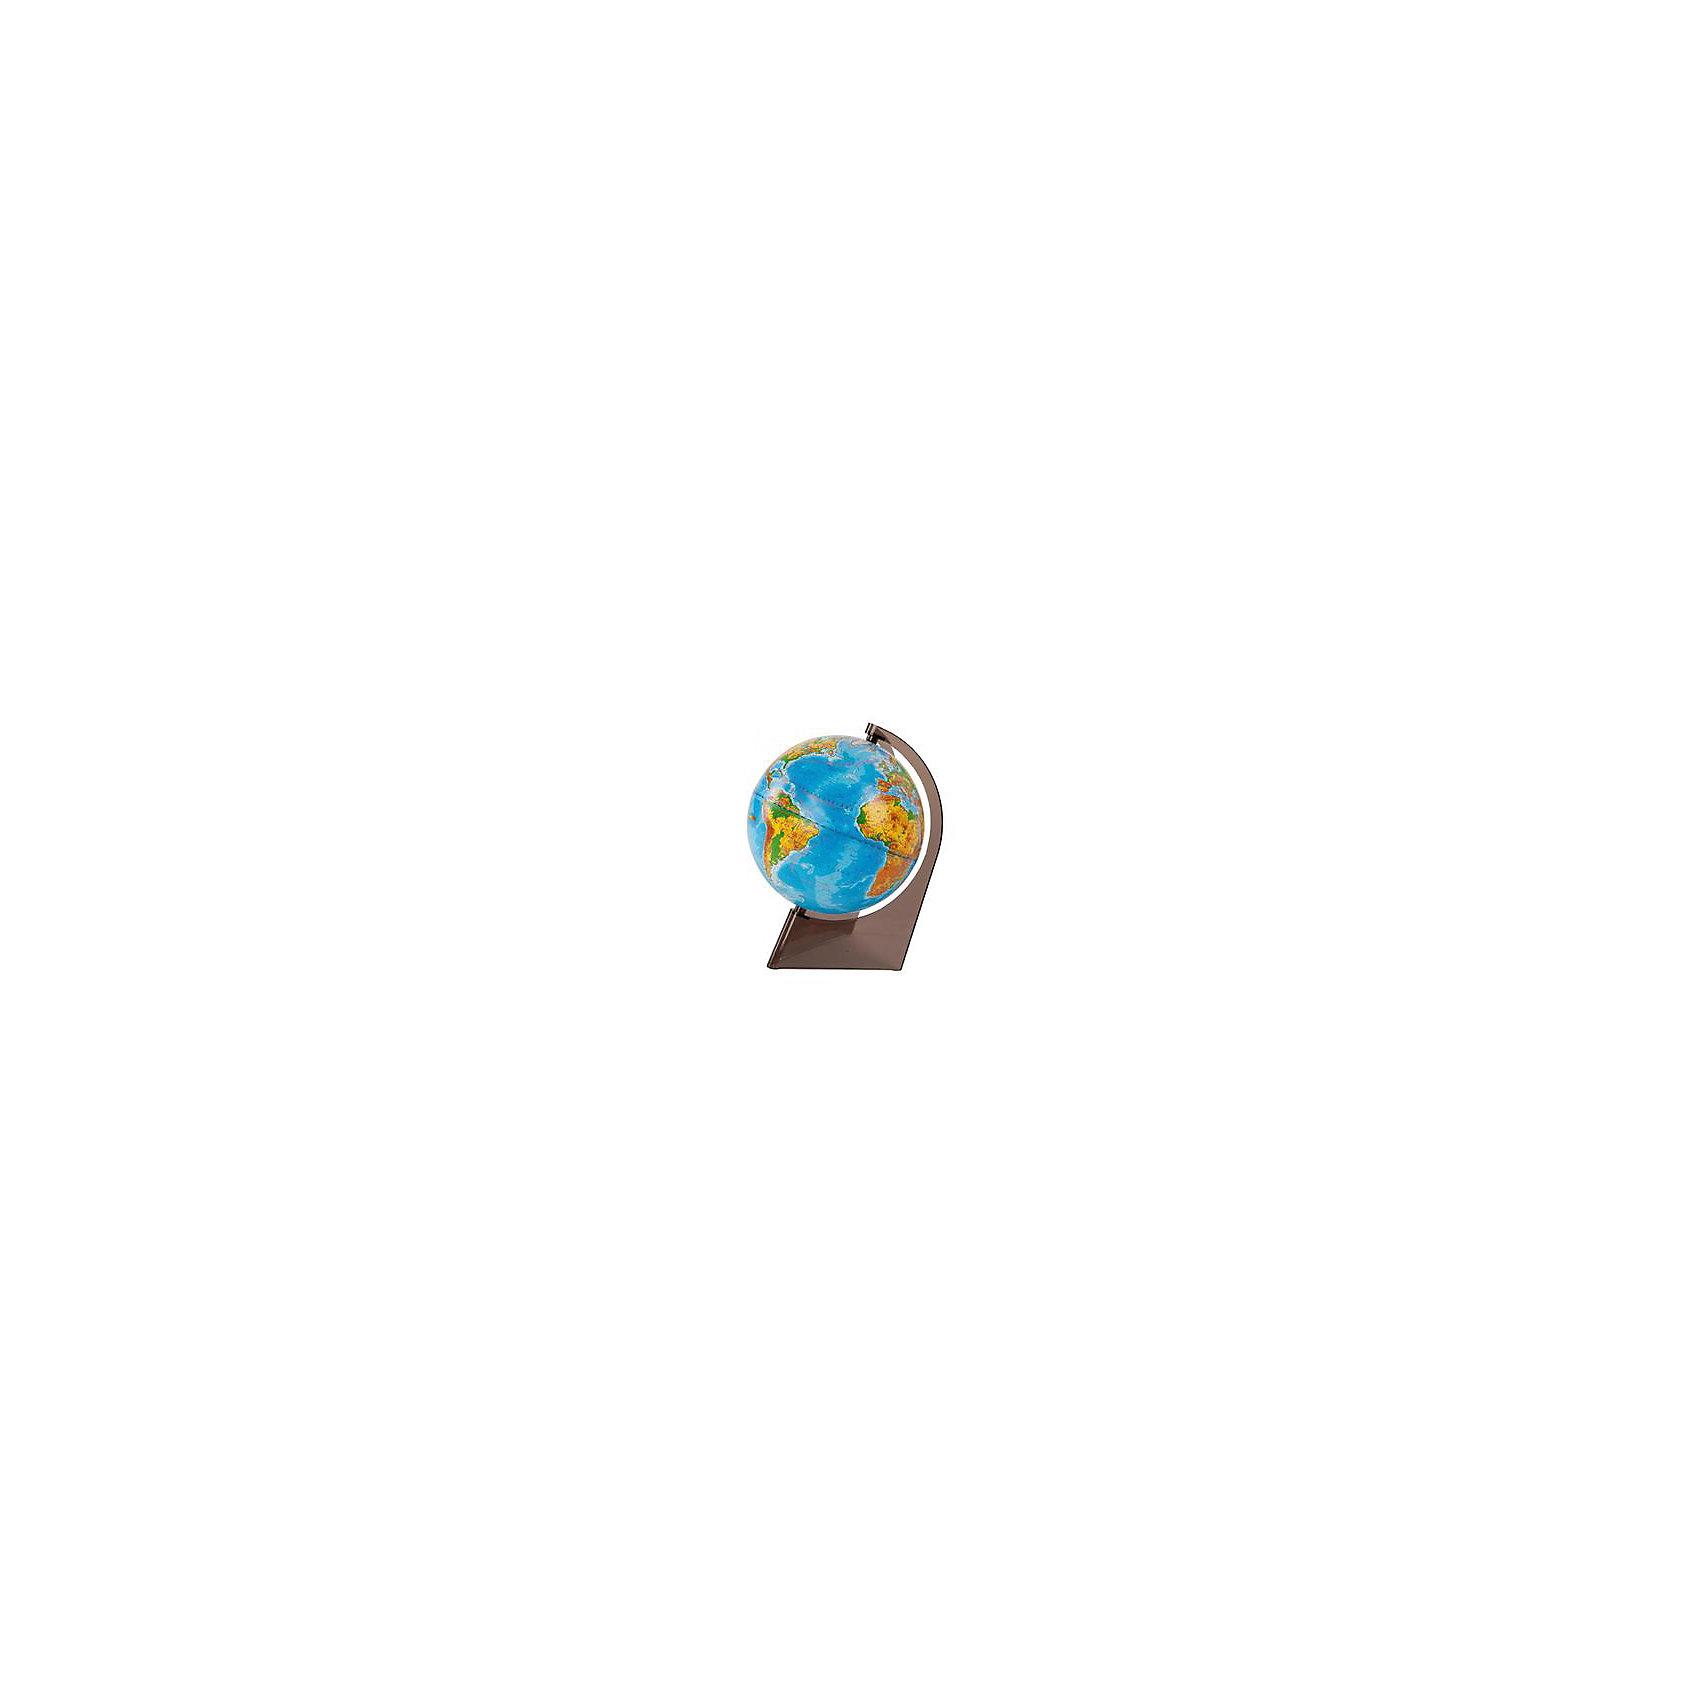 Глобус Земли физический на треугольнике, диаметр 210 ммДиаметр: 210 мм<br><br>Масштаб: 1:60 000 000<br><br>Материал подставки: Пластик<br><br>Цвет подставки: Прозрачный<br><br>Ширина мм: 217<br>Глубина мм: 217<br>Высота мм: 315<br>Вес г: 650<br>Возраст от месяцев: 72<br>Возраст до месяцев: 2147483647<br>Пол: Унисекс<br>Возраст: Детский<br>SKU: 5518206